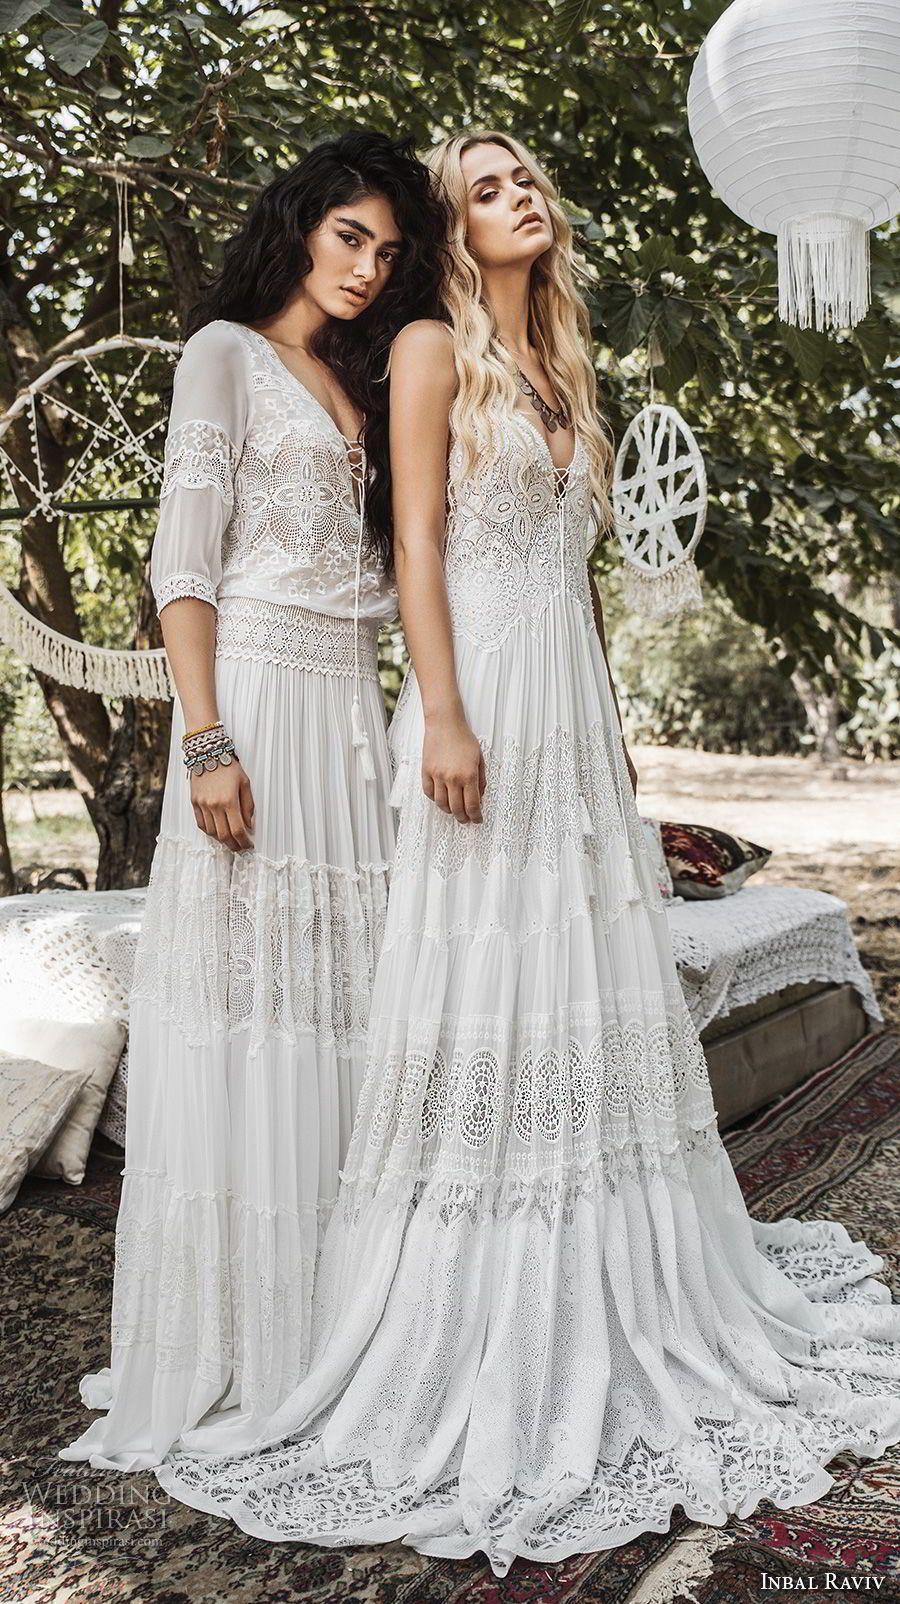 Inbal Raviv 2017 Wedding Dresses   wedding wishes   Pinterest ...